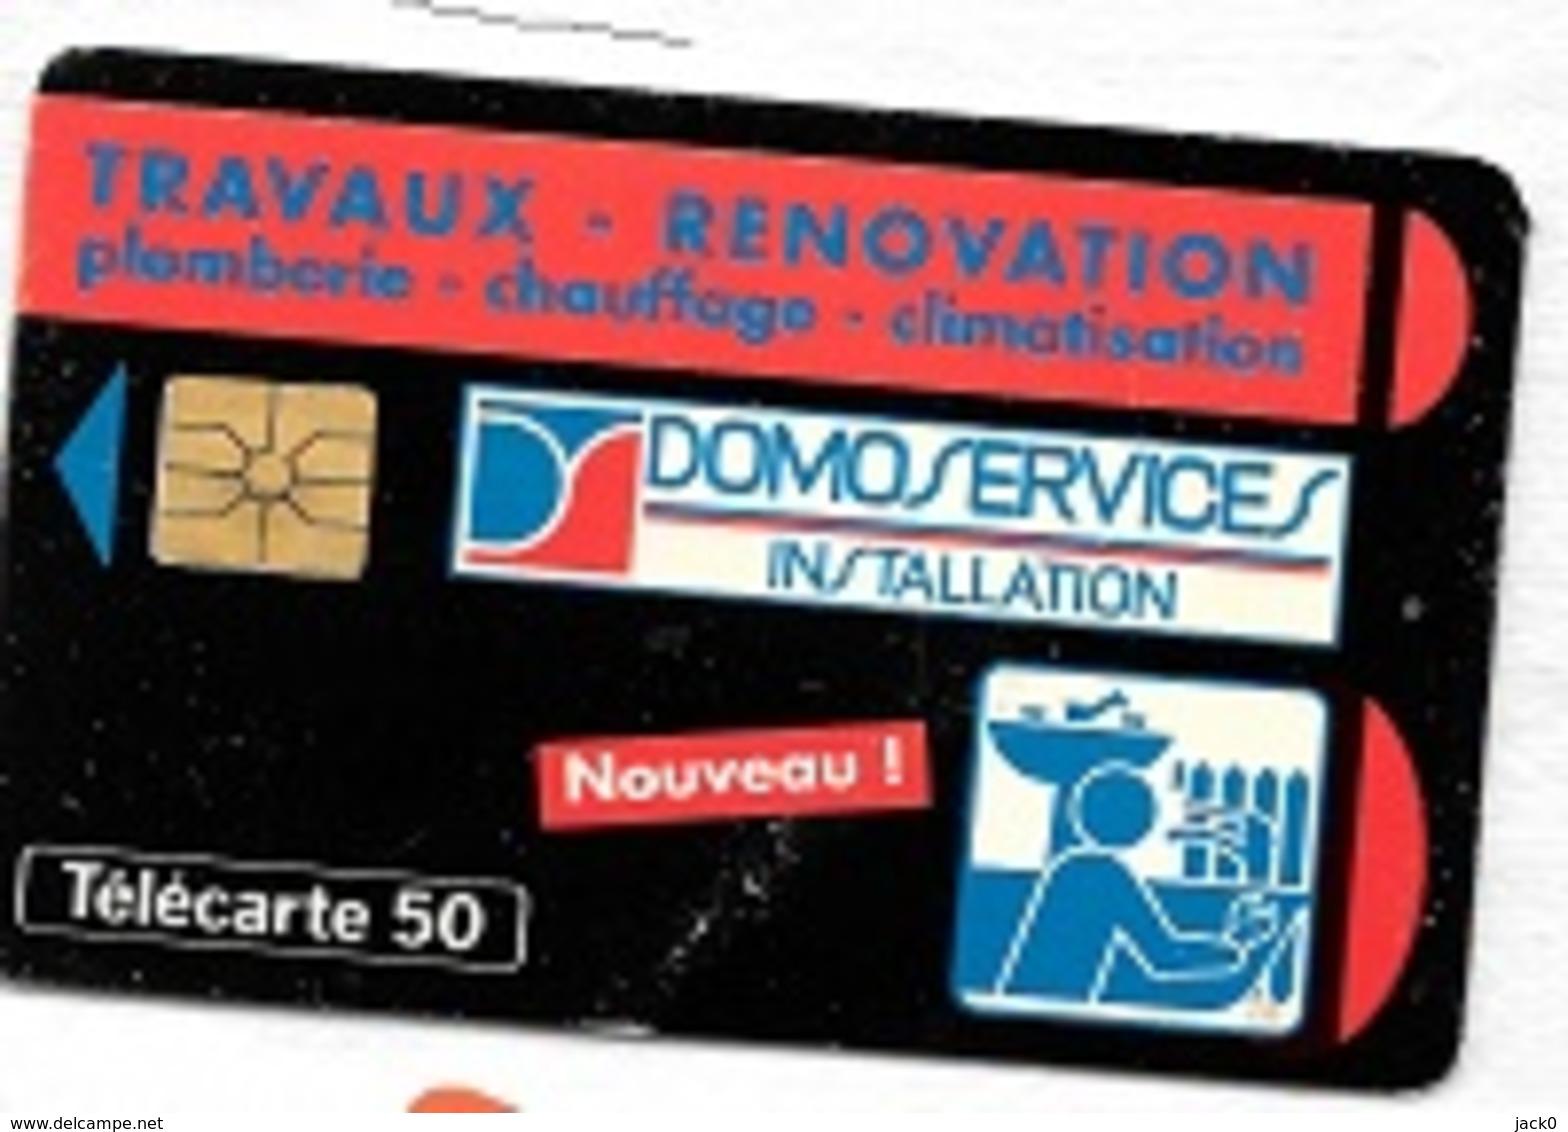 Télécarte  50 U, En 685, DOMOSERVICES  INSTALLATION,  06 / 93, 9000 Ex  ( En  L' état ) - France